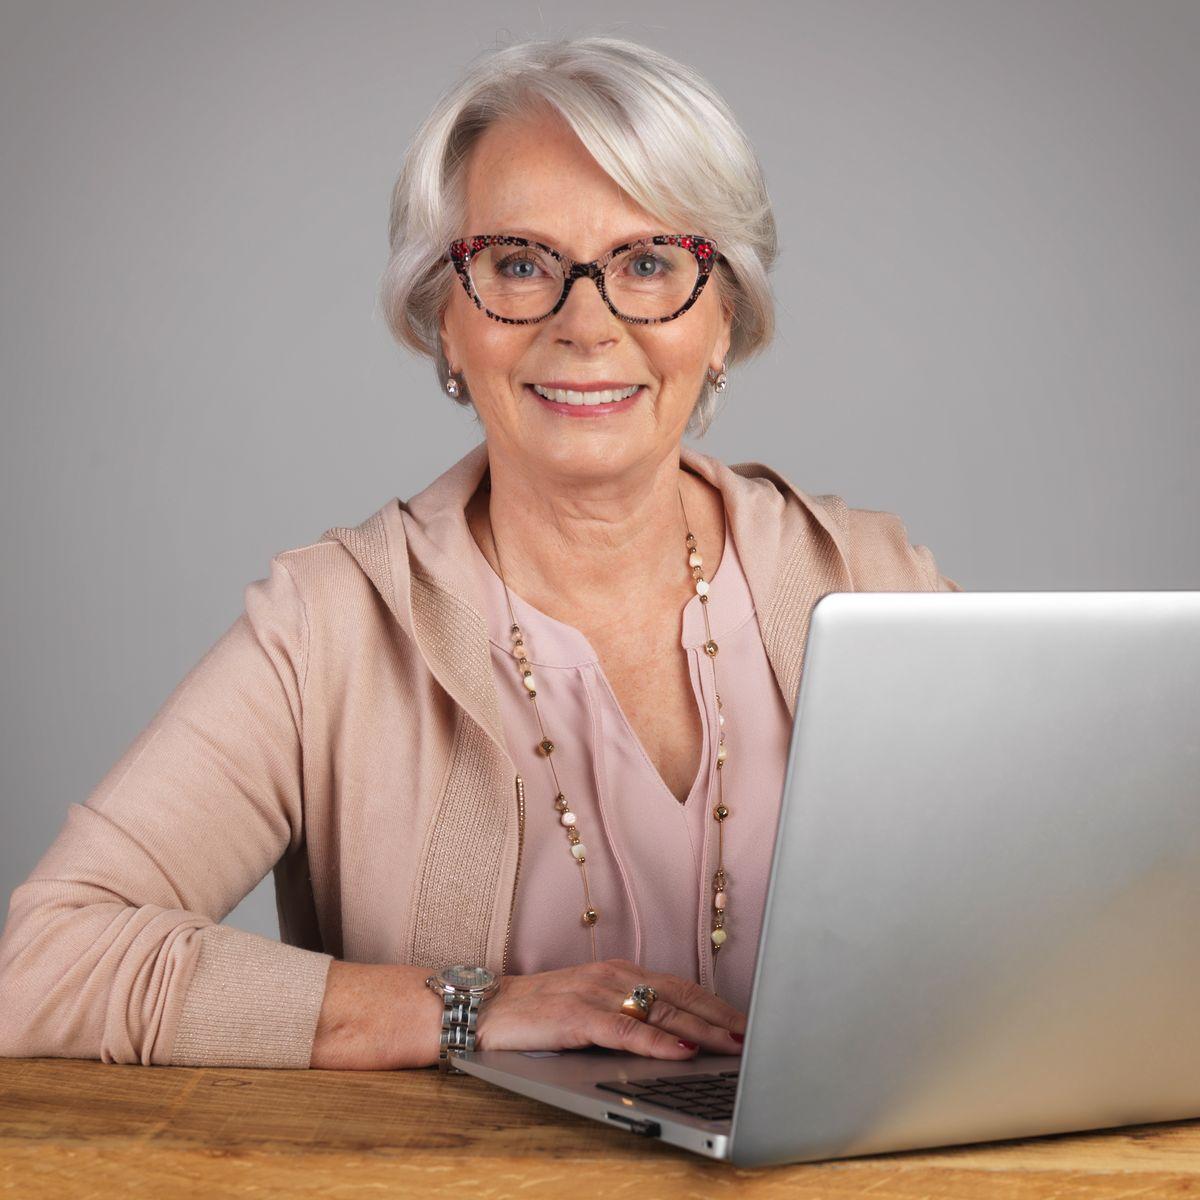 Francine Caillard, fondatrice du cabinet de coaching Simply Self Growth